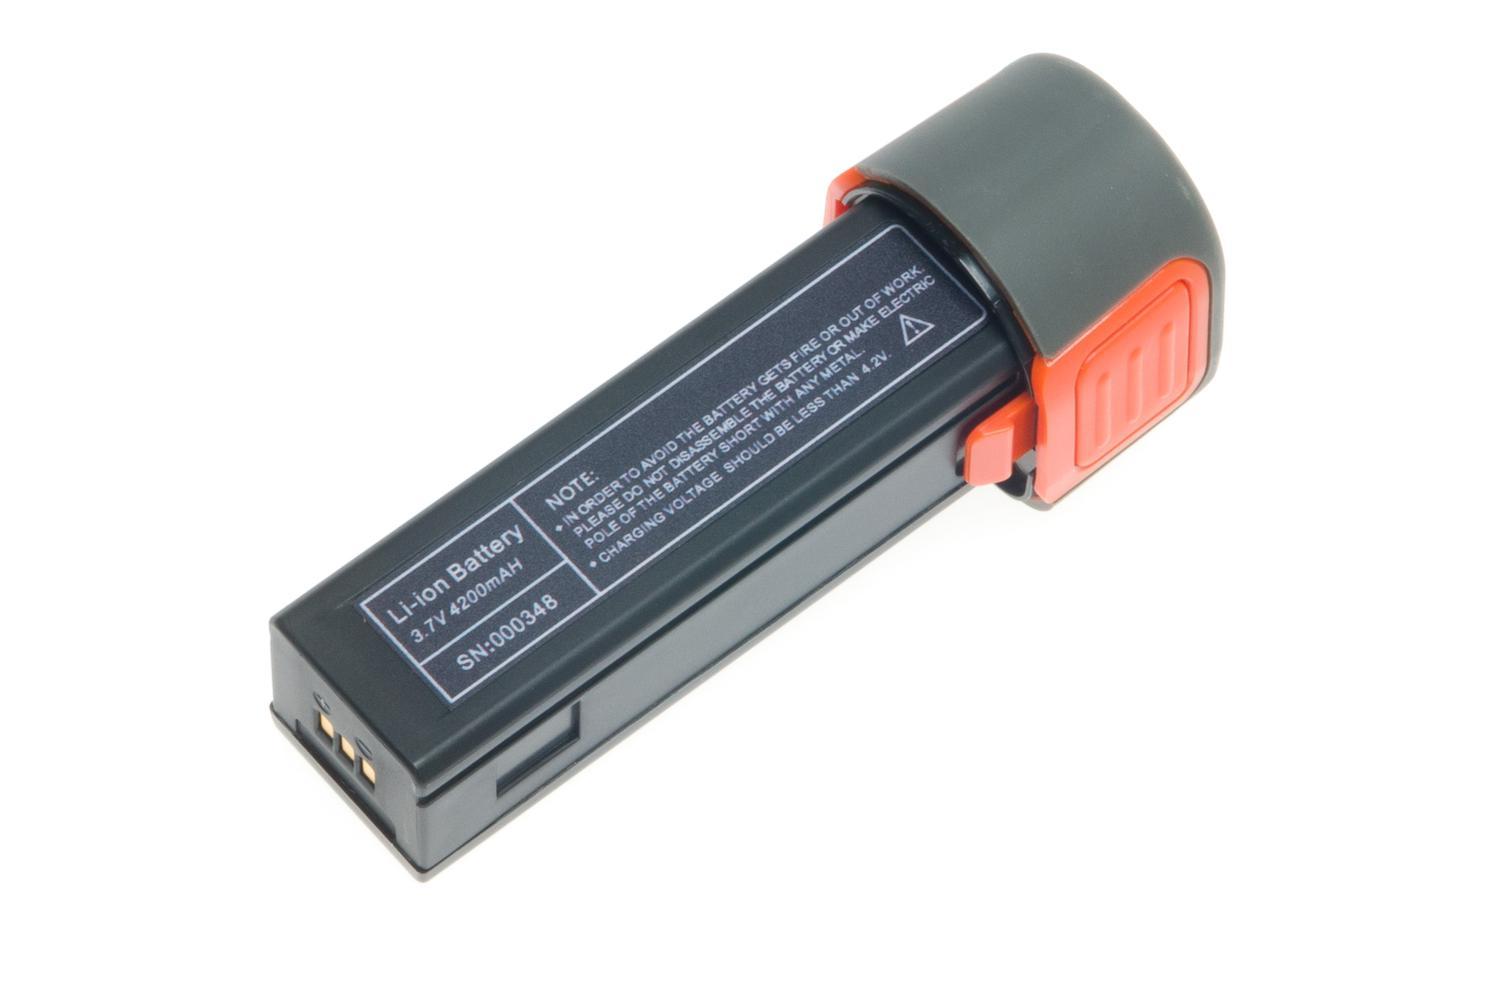 AKU-13 Akumulator 3,7 V 4,2 Ah